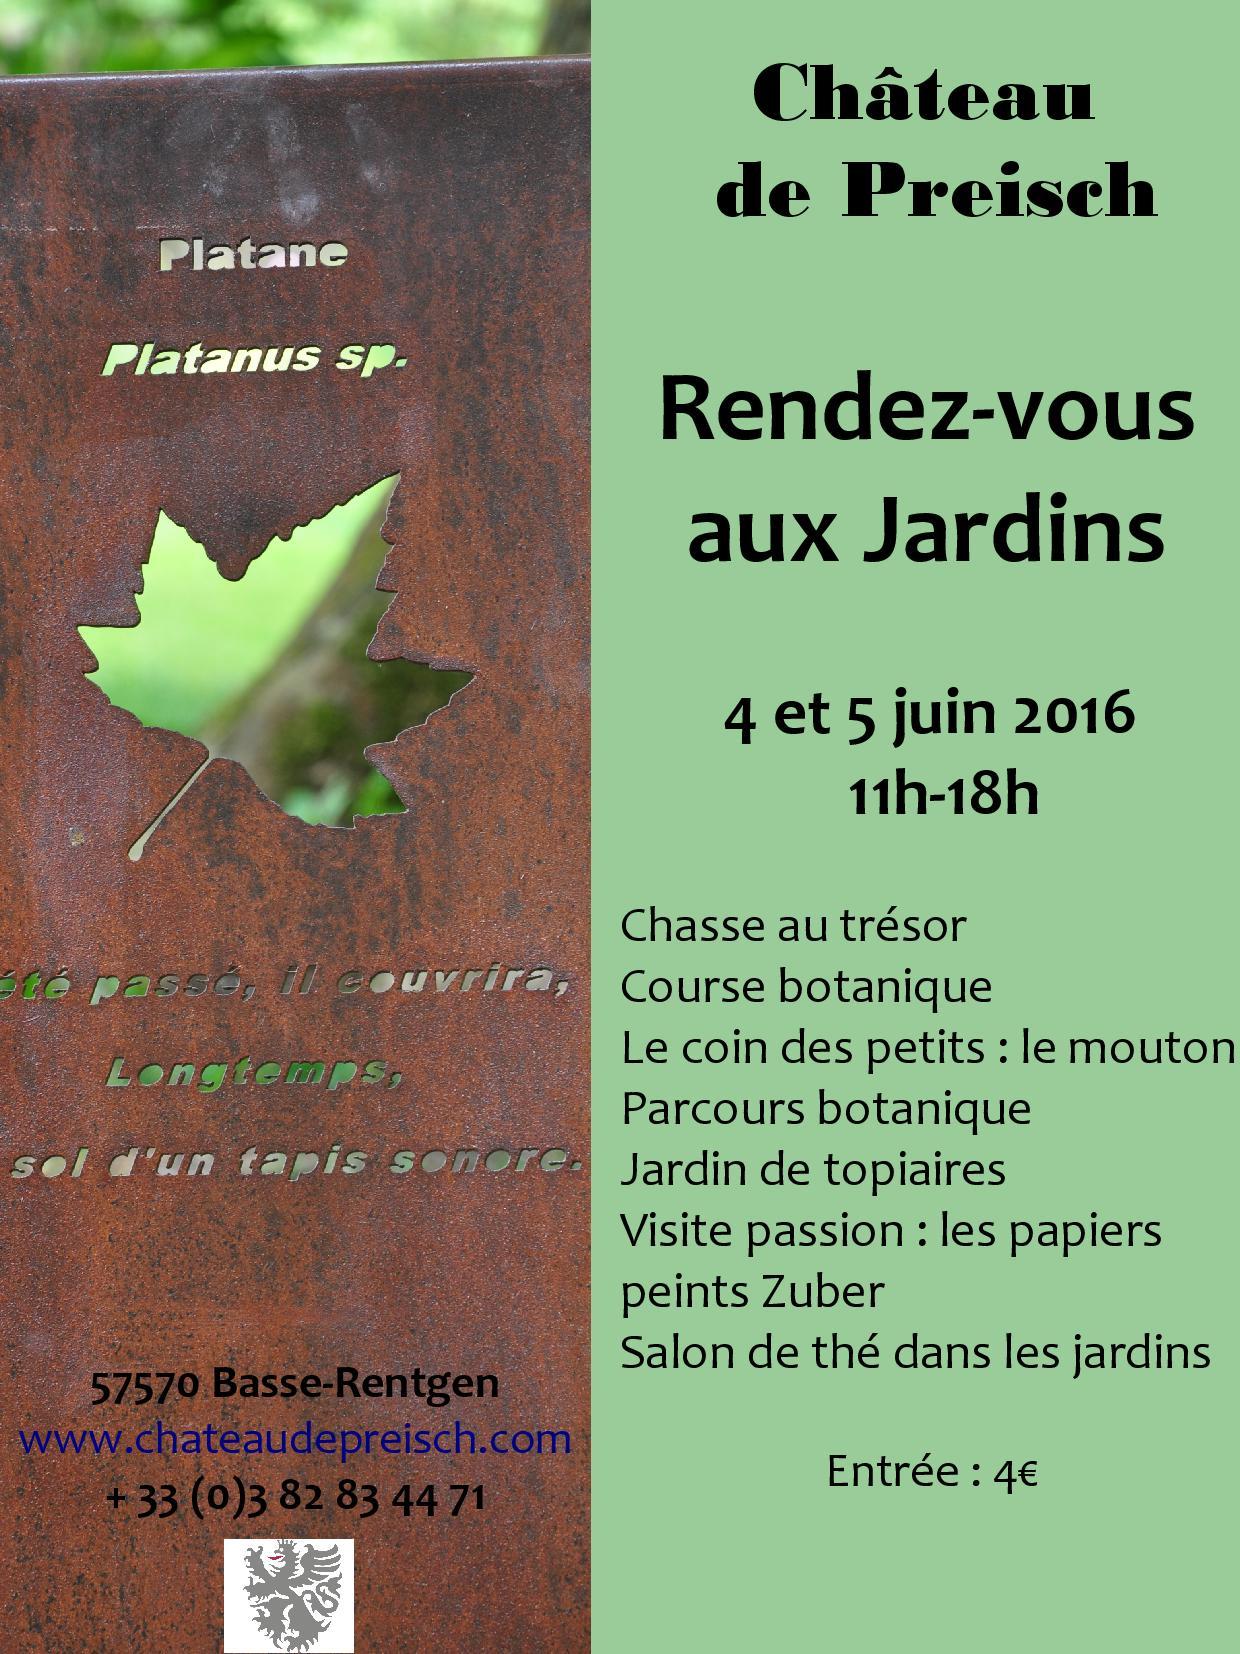 Affiche RDV Jardins 2016